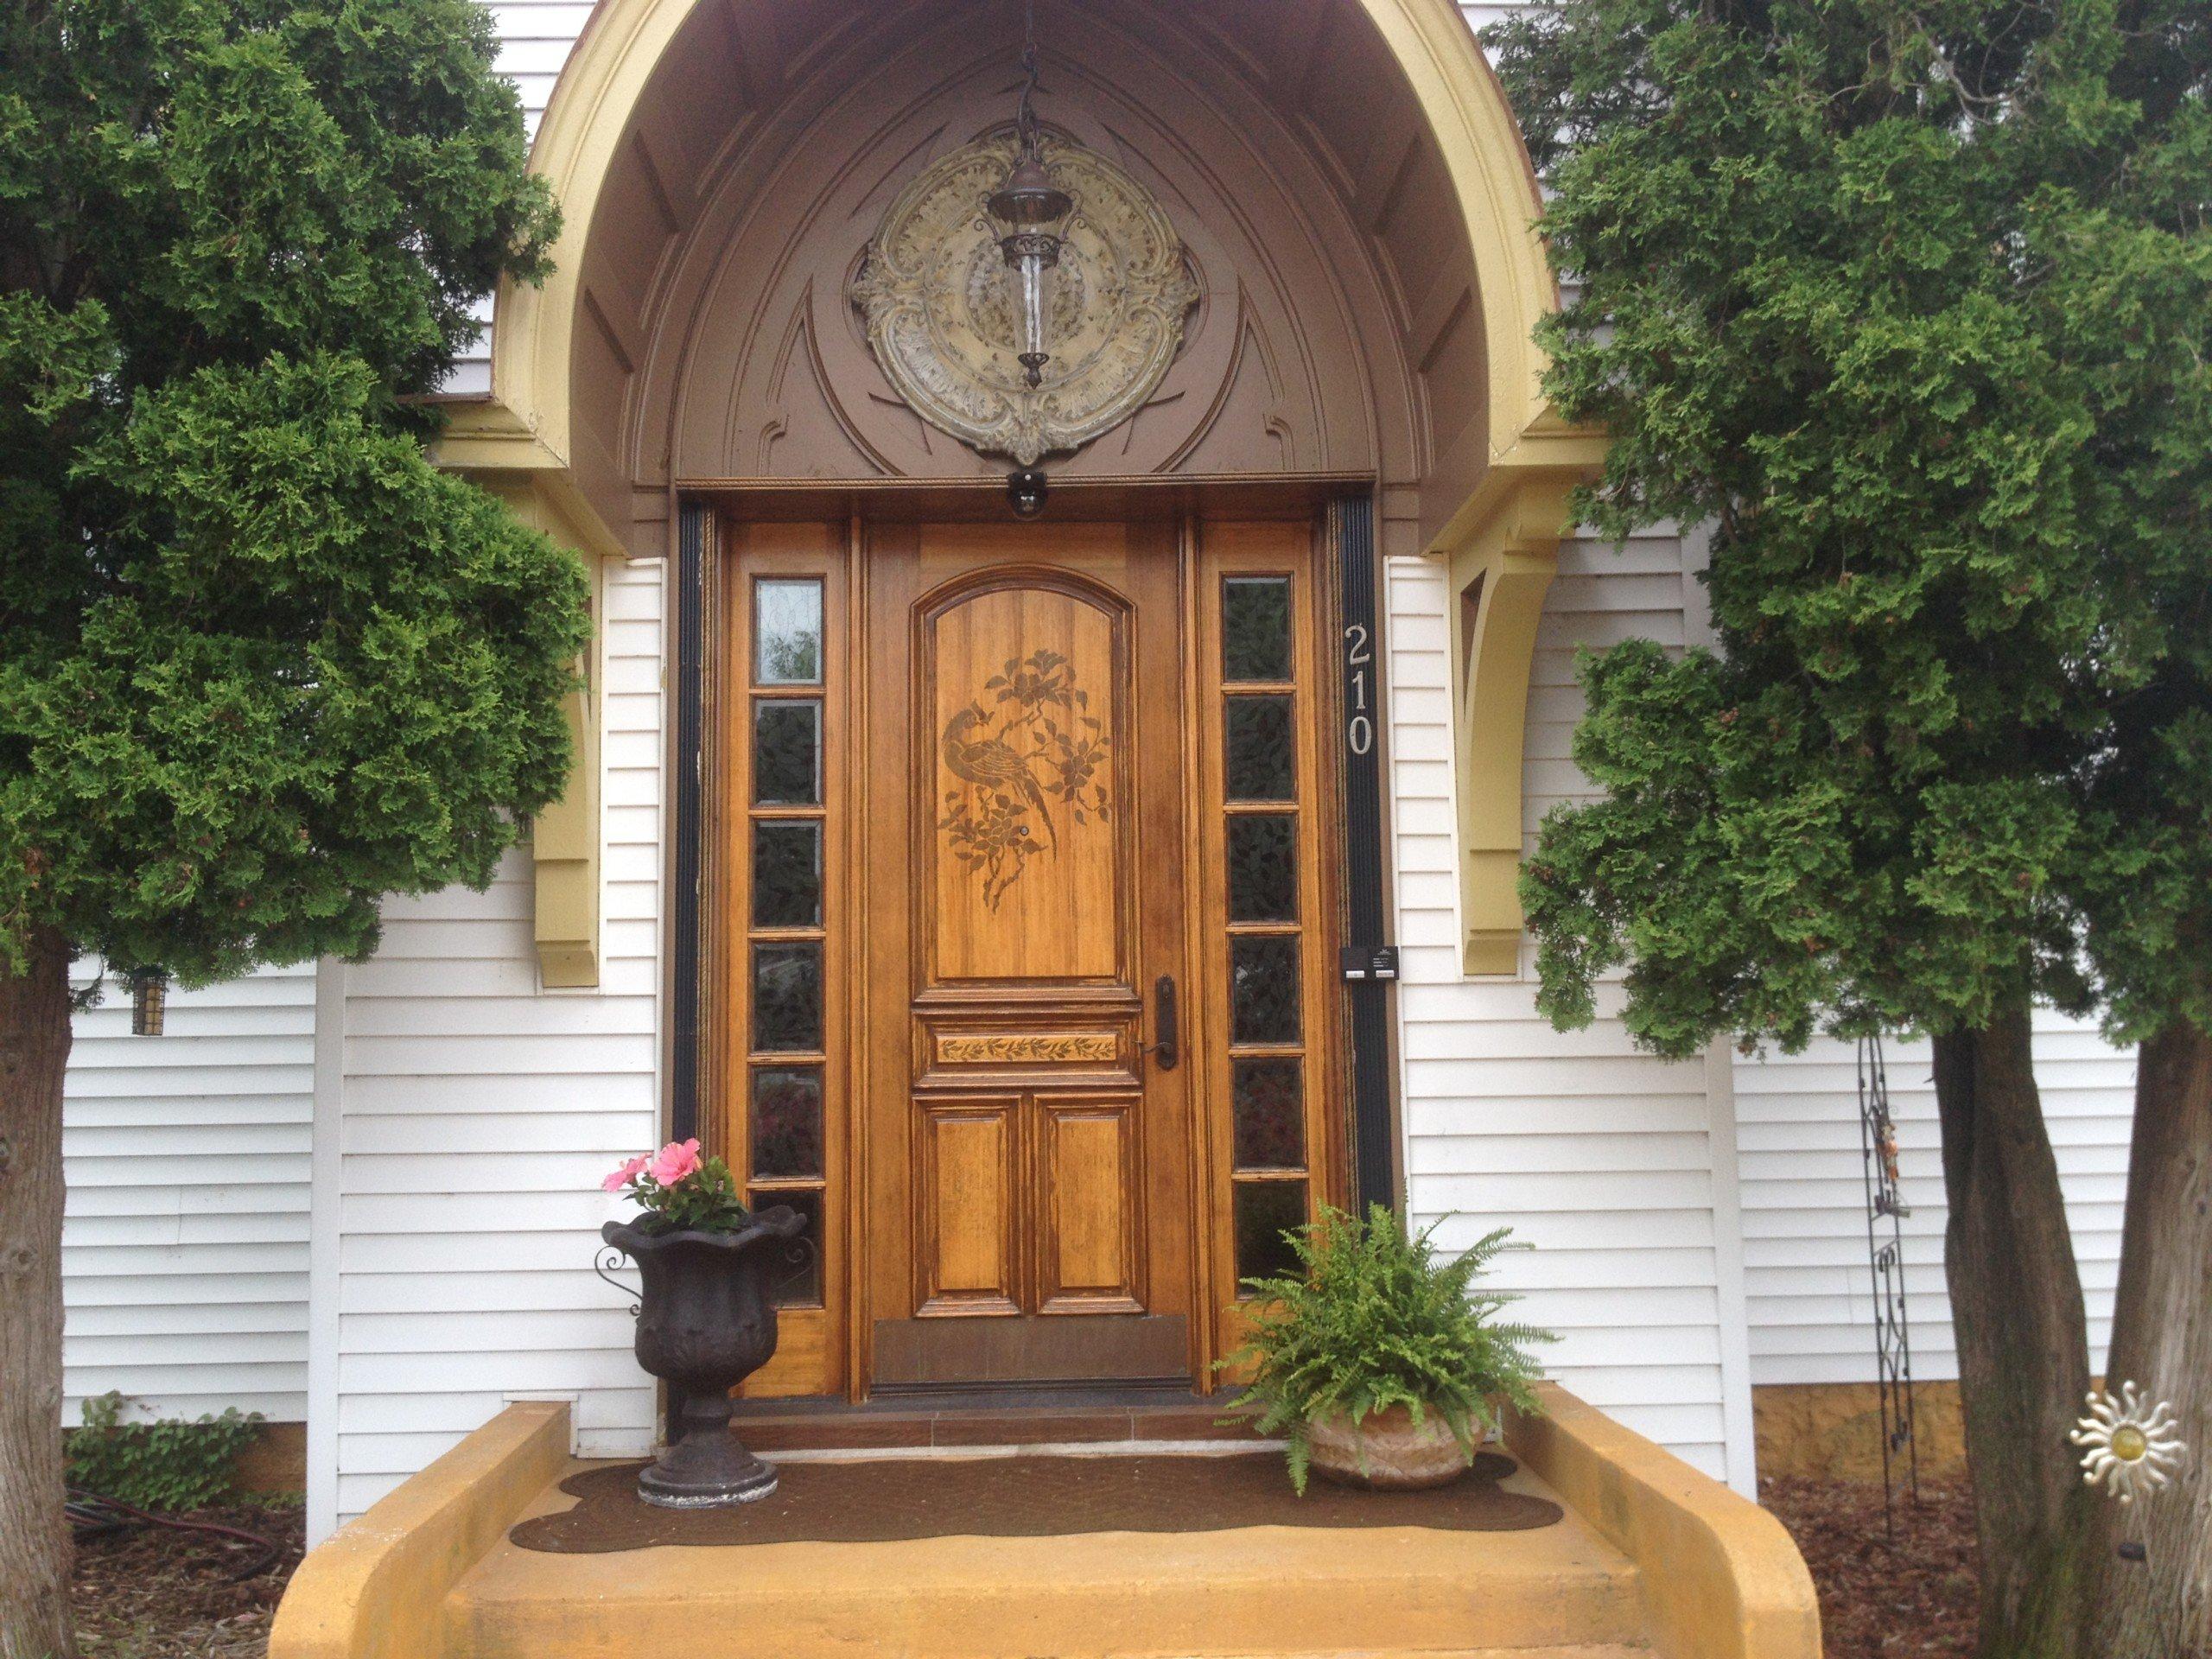 210 N. East Street Weyauwega, Wisconsin 54983-2